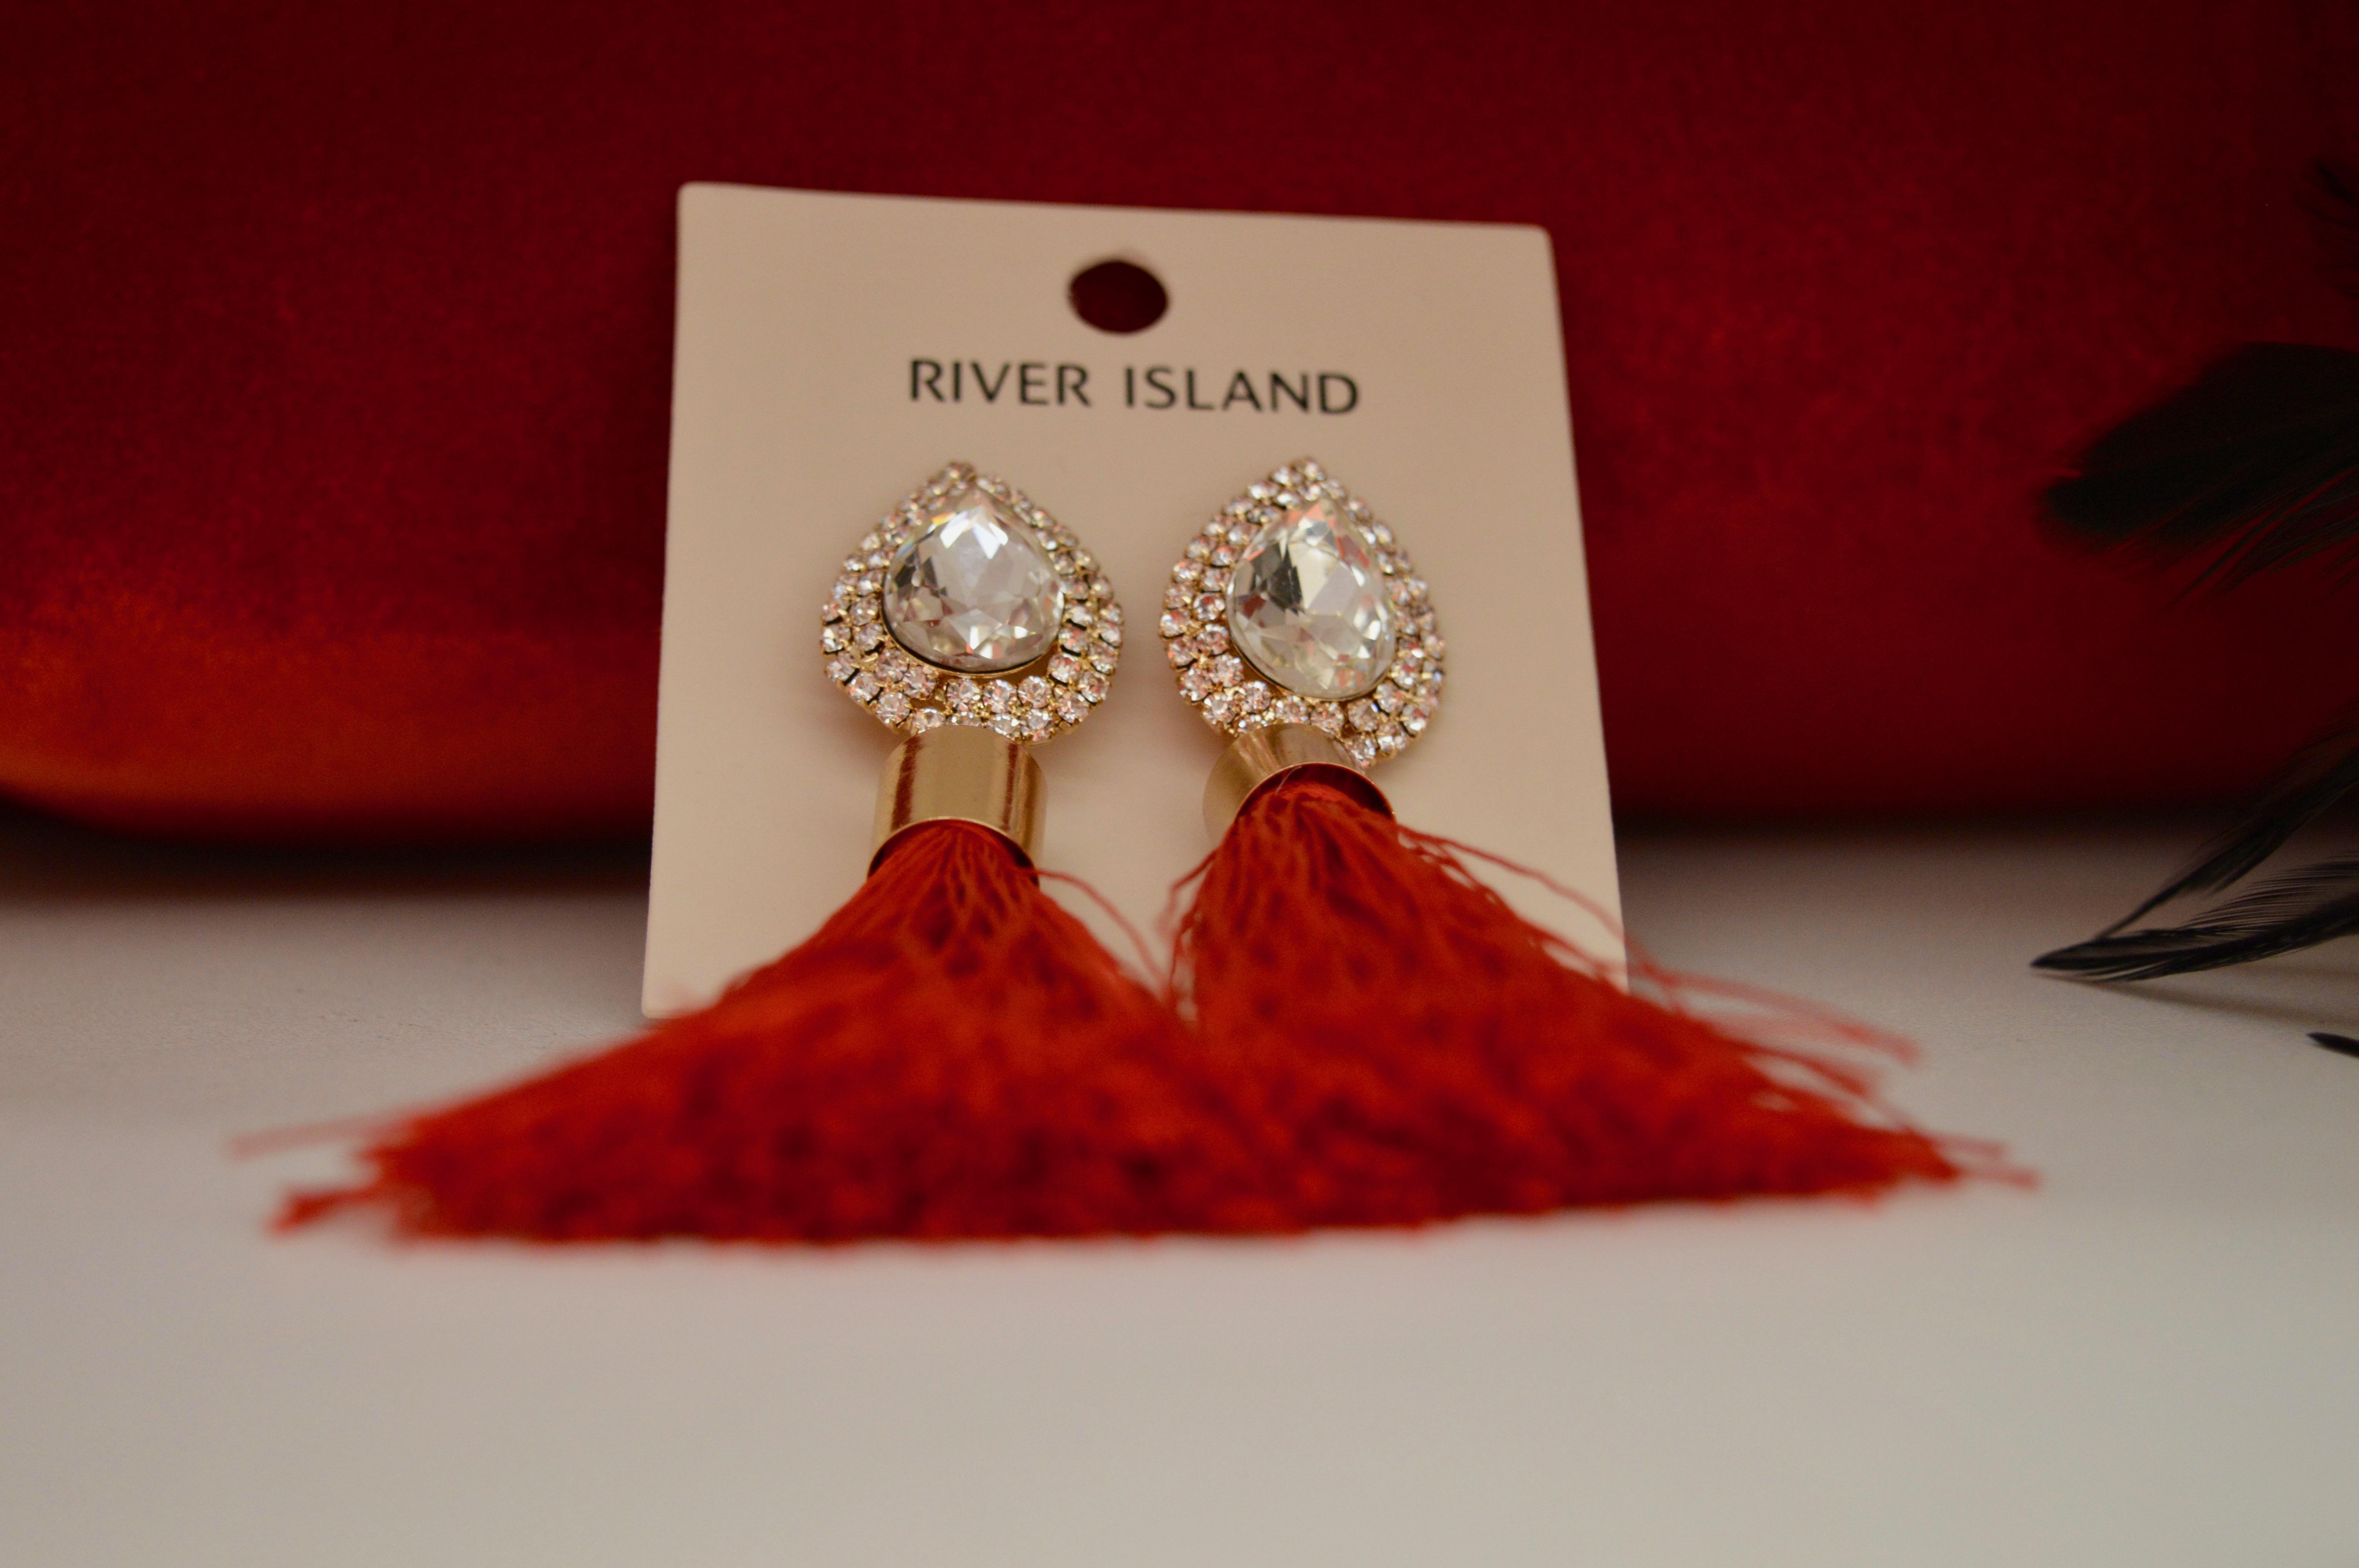 Fashion Jewellery river-island-tassle-earrings-intu-eldon-square-winter-fashion-stylissimo-newcastle-high-street-halloween-elle-blonde-luxury-lifestyle-destination-blog